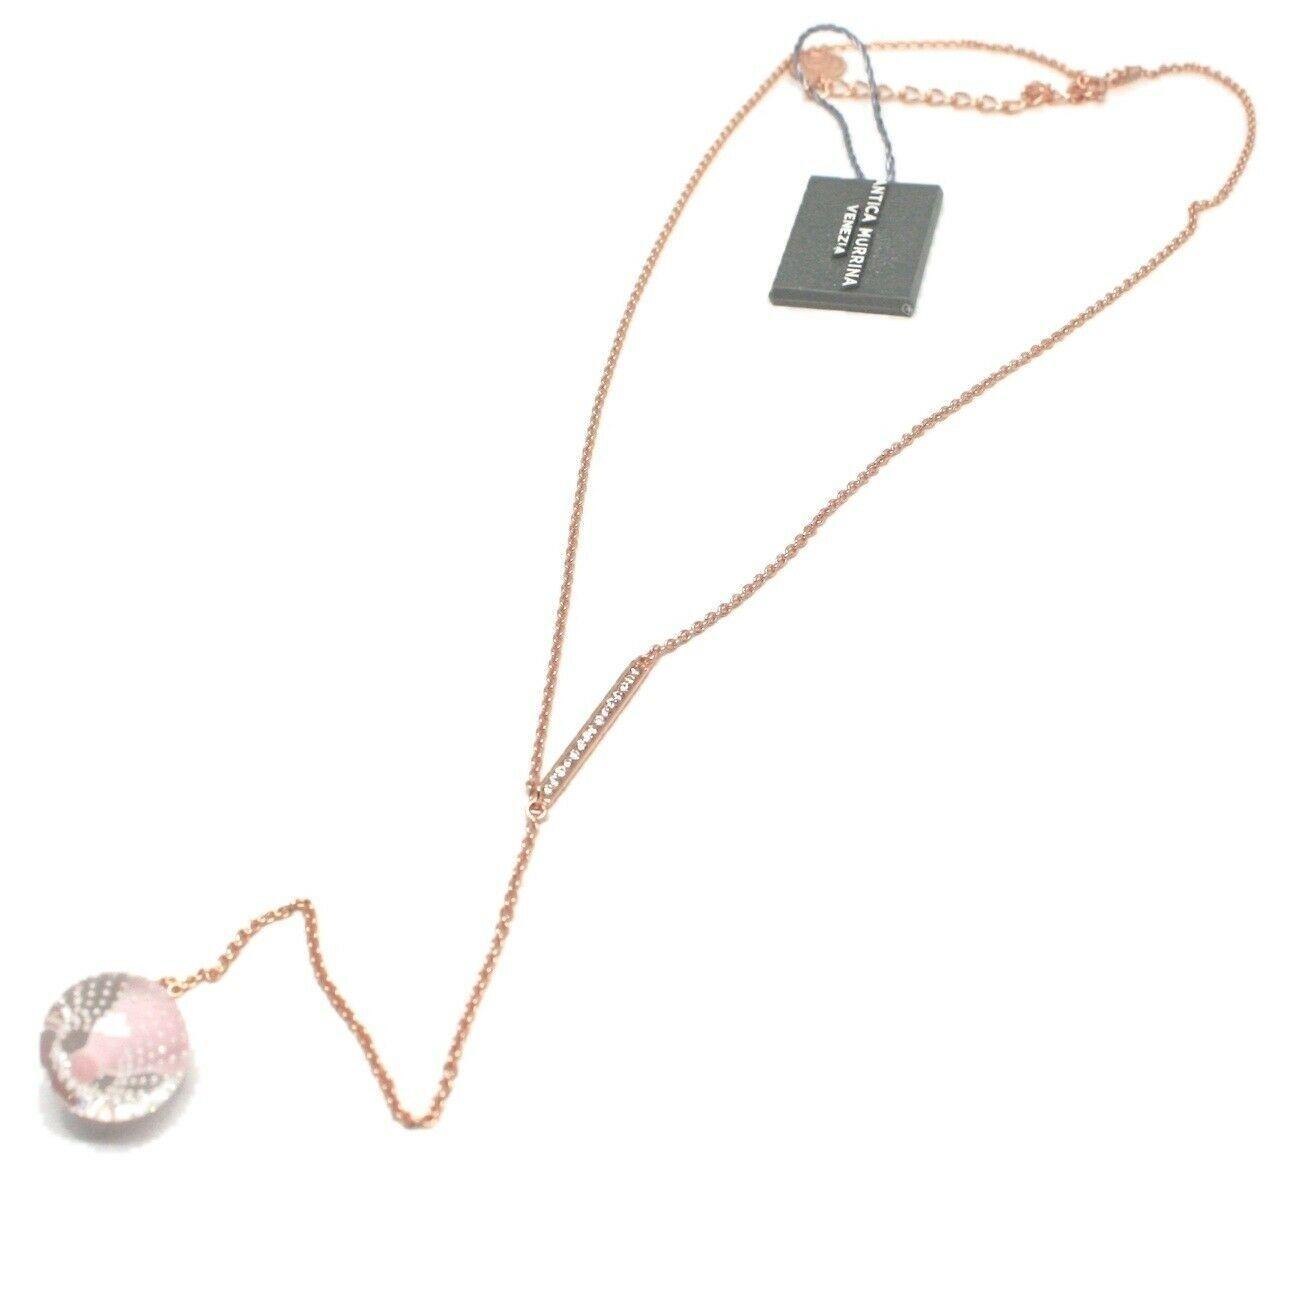 Collar Antica Murrina Venezia de Plata 925 con Cristal de Murano AMVJWCP009C03